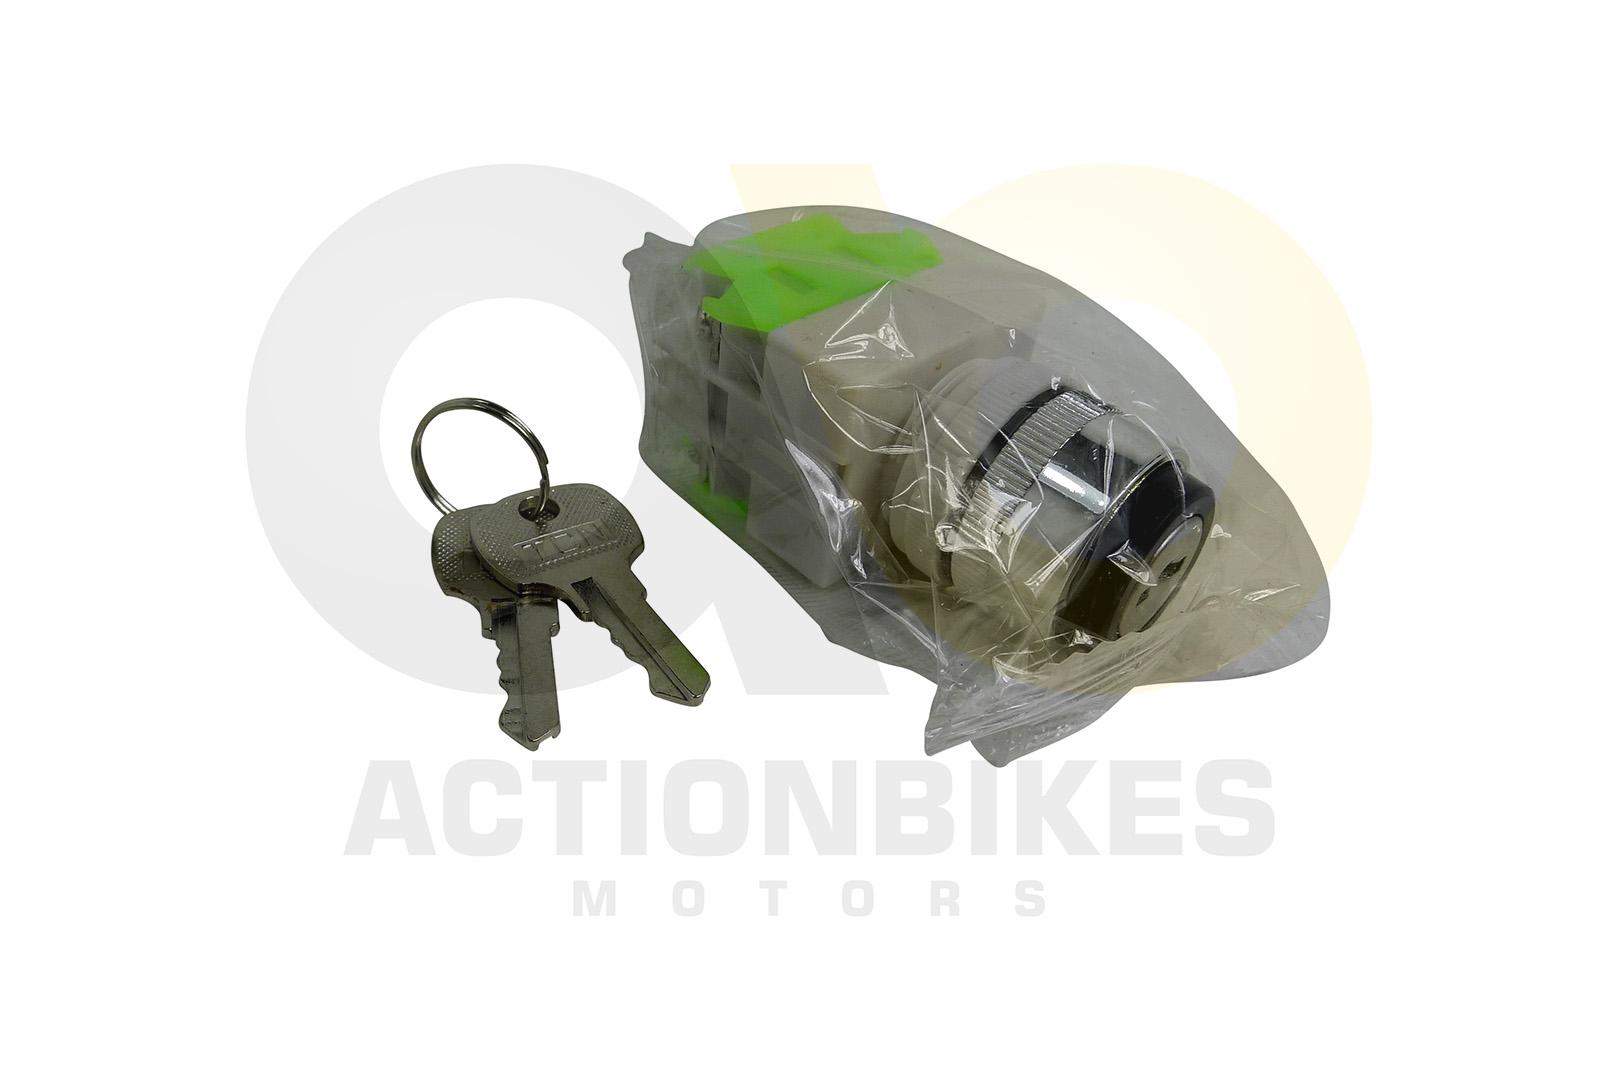 Miniquad Elektro 800W / Fox XTR / Highper / Gazelle Schalter ...